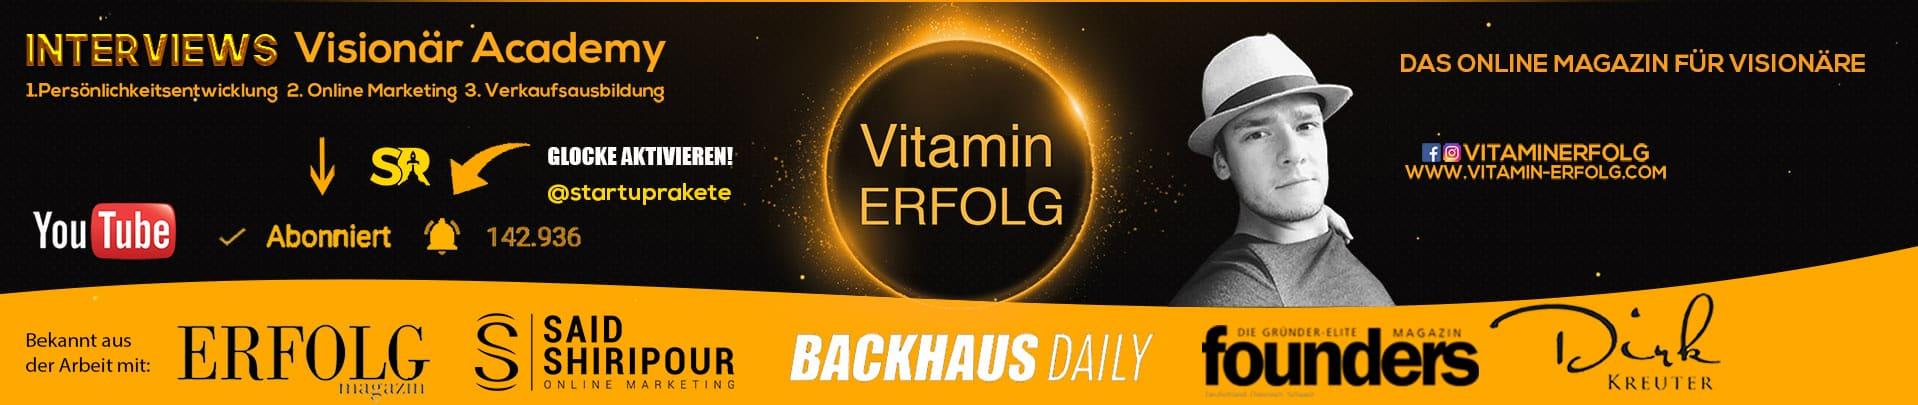 Vitaminerfolg Banner symetrisch youtube Startup rakete1 (1)